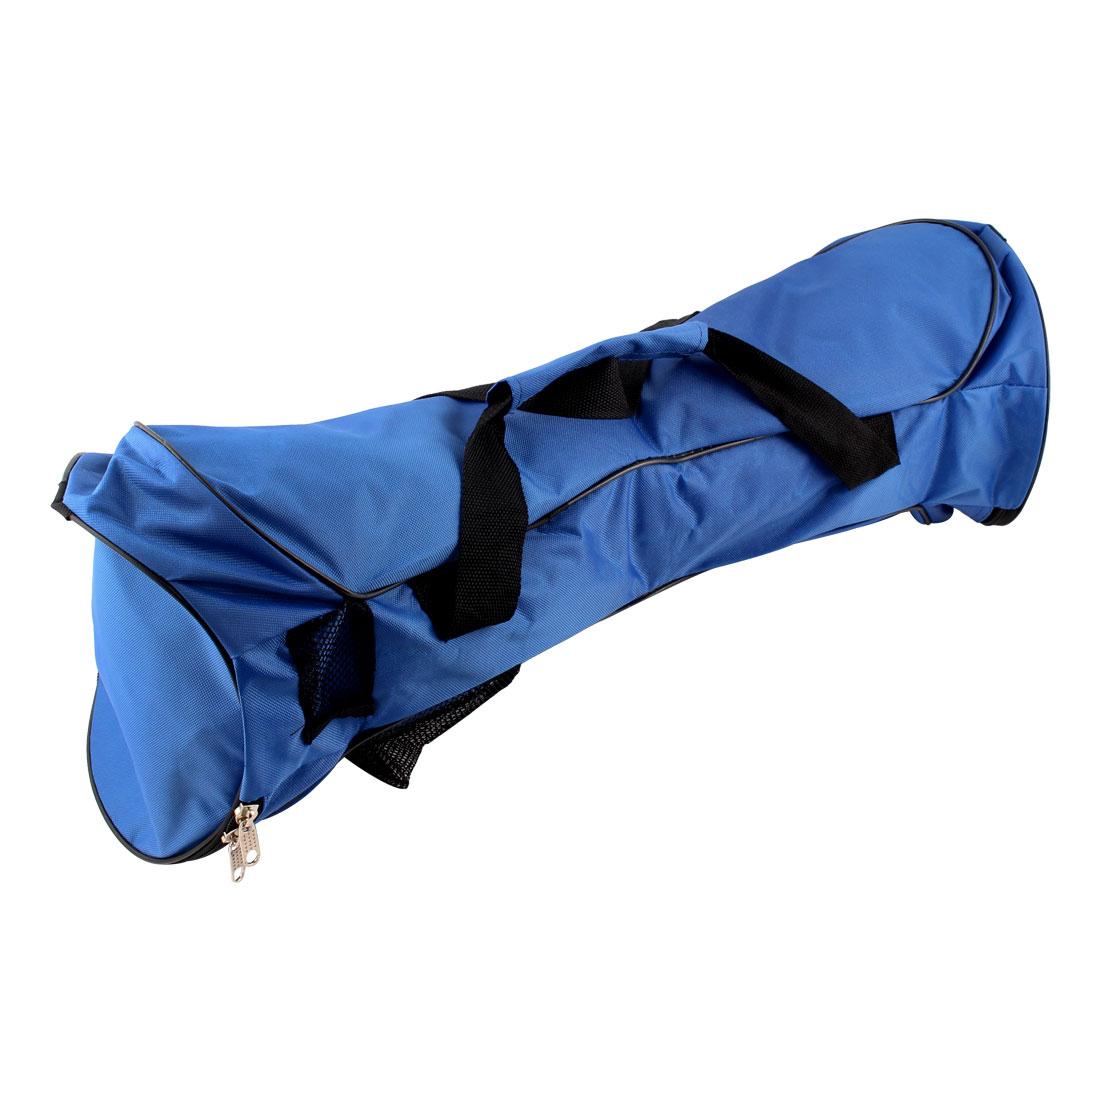 "Self Balancing Wheel Carry Bag Case Backpack Blue 9"" Diameter"